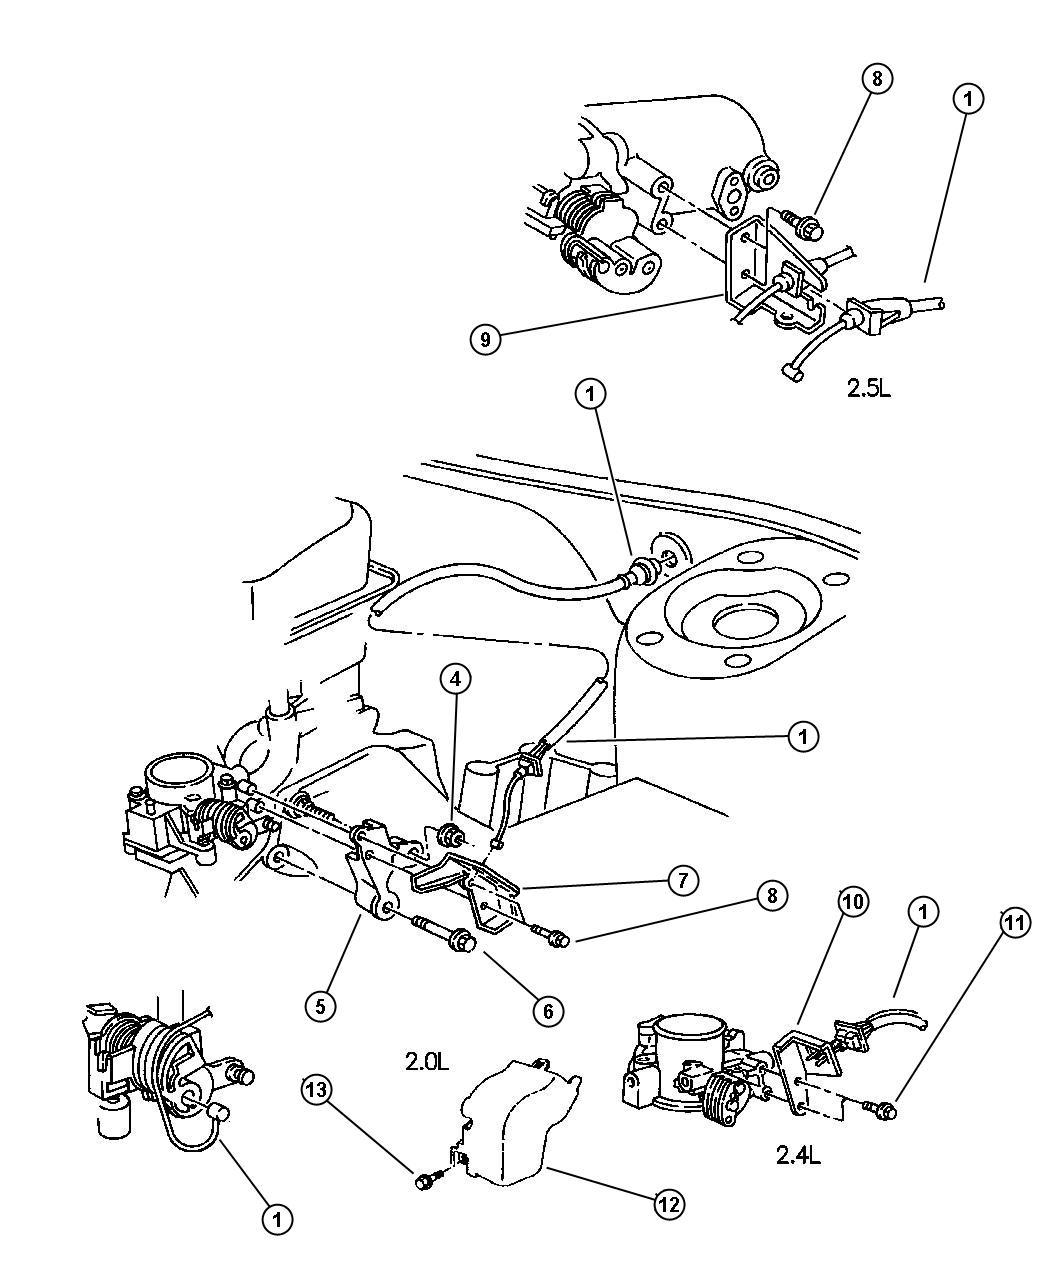 1998 Chrysler Cirrus Grommet. Throttle control cable